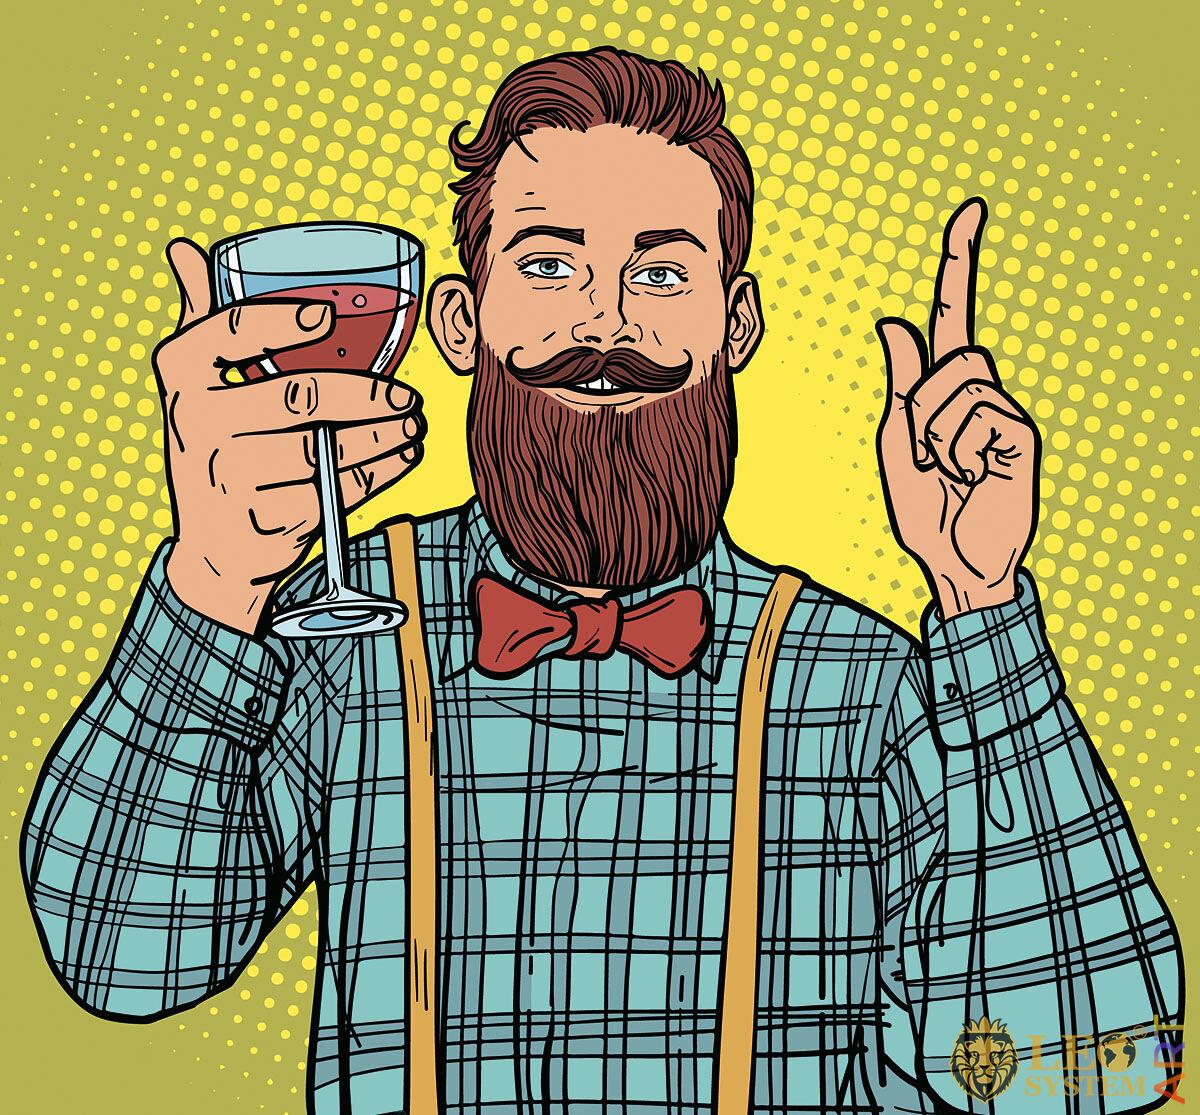 Satisfied man with cute beard